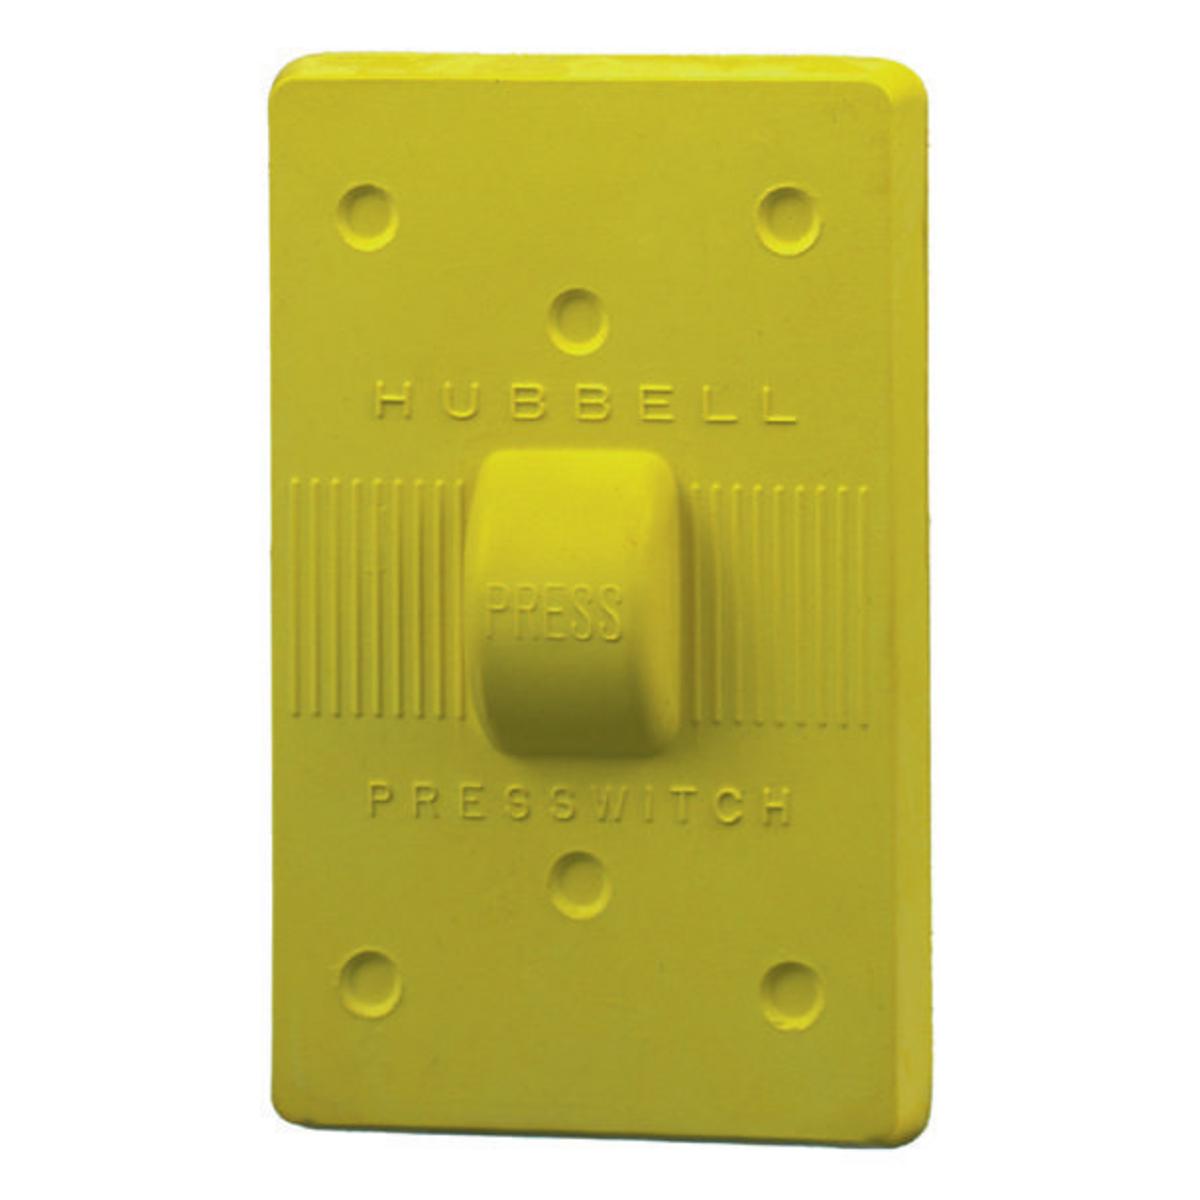 Hubbell HBL17CM50 Yellow Neoprene Weatherproof Plate